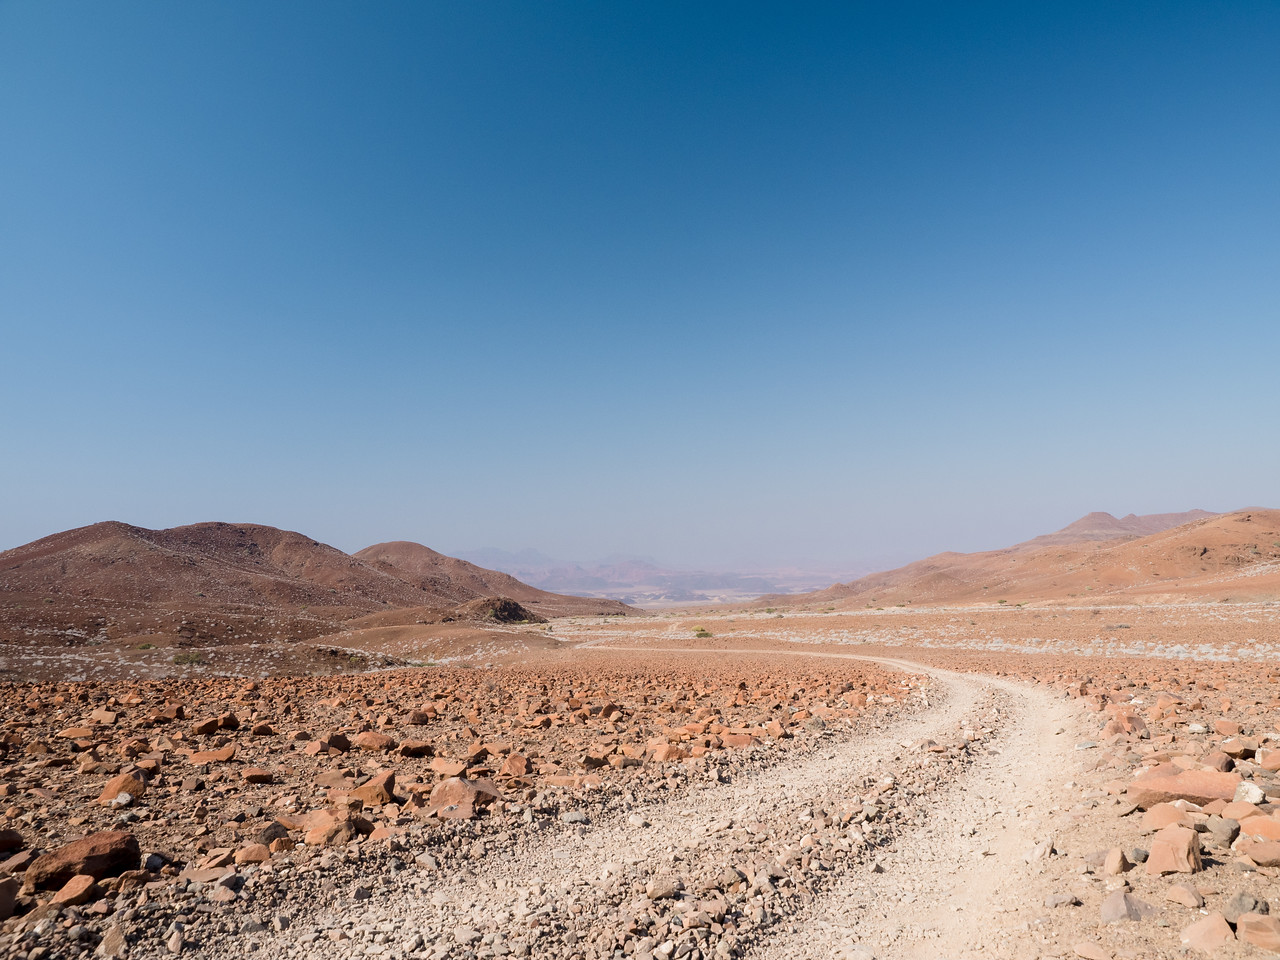 Desolation Valley, Nambia